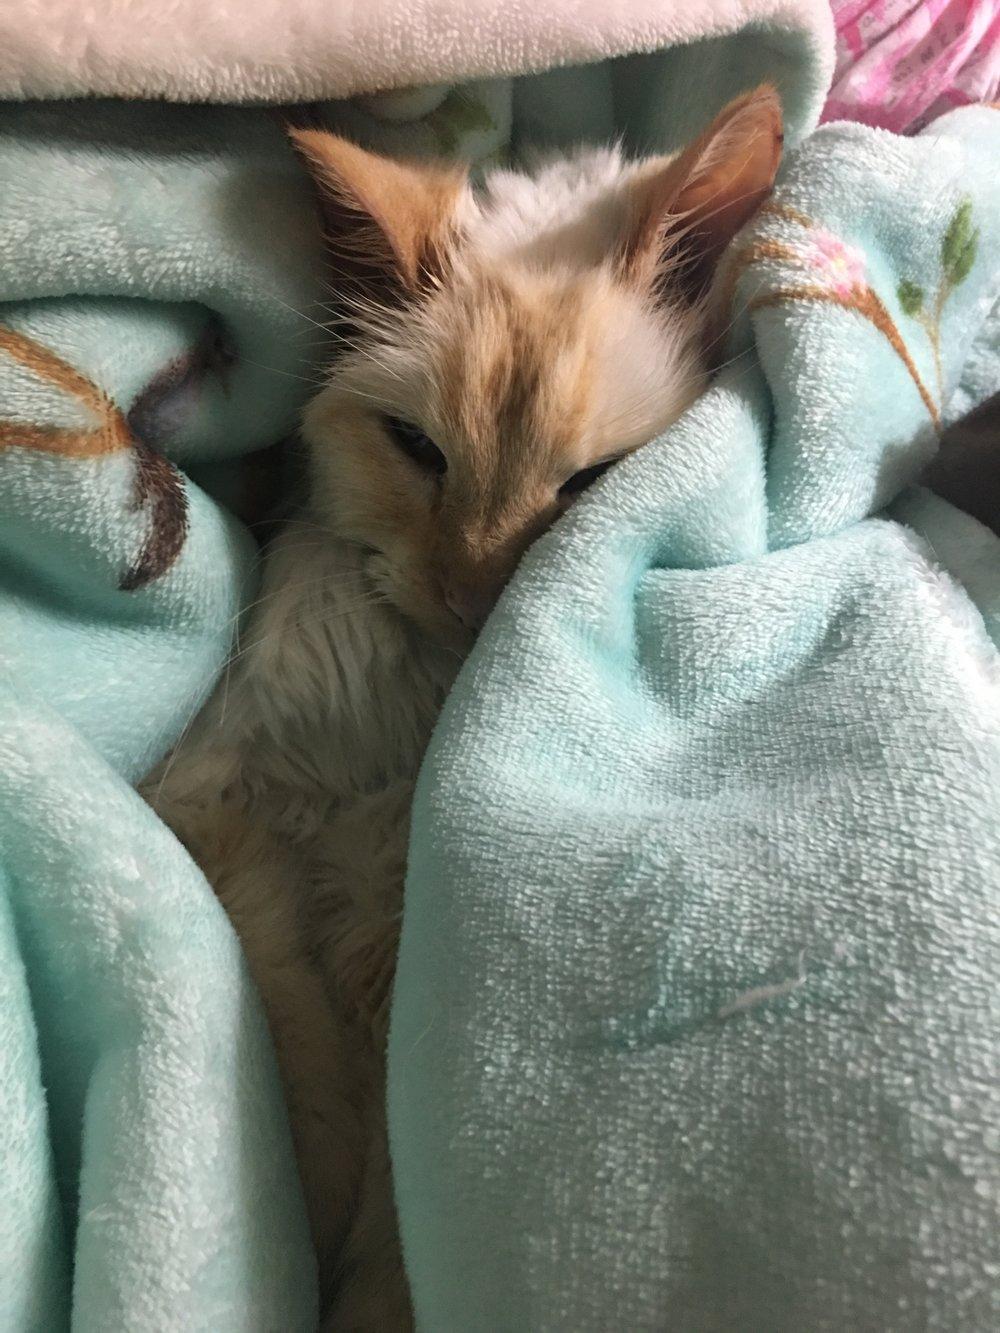 Poor kitty.